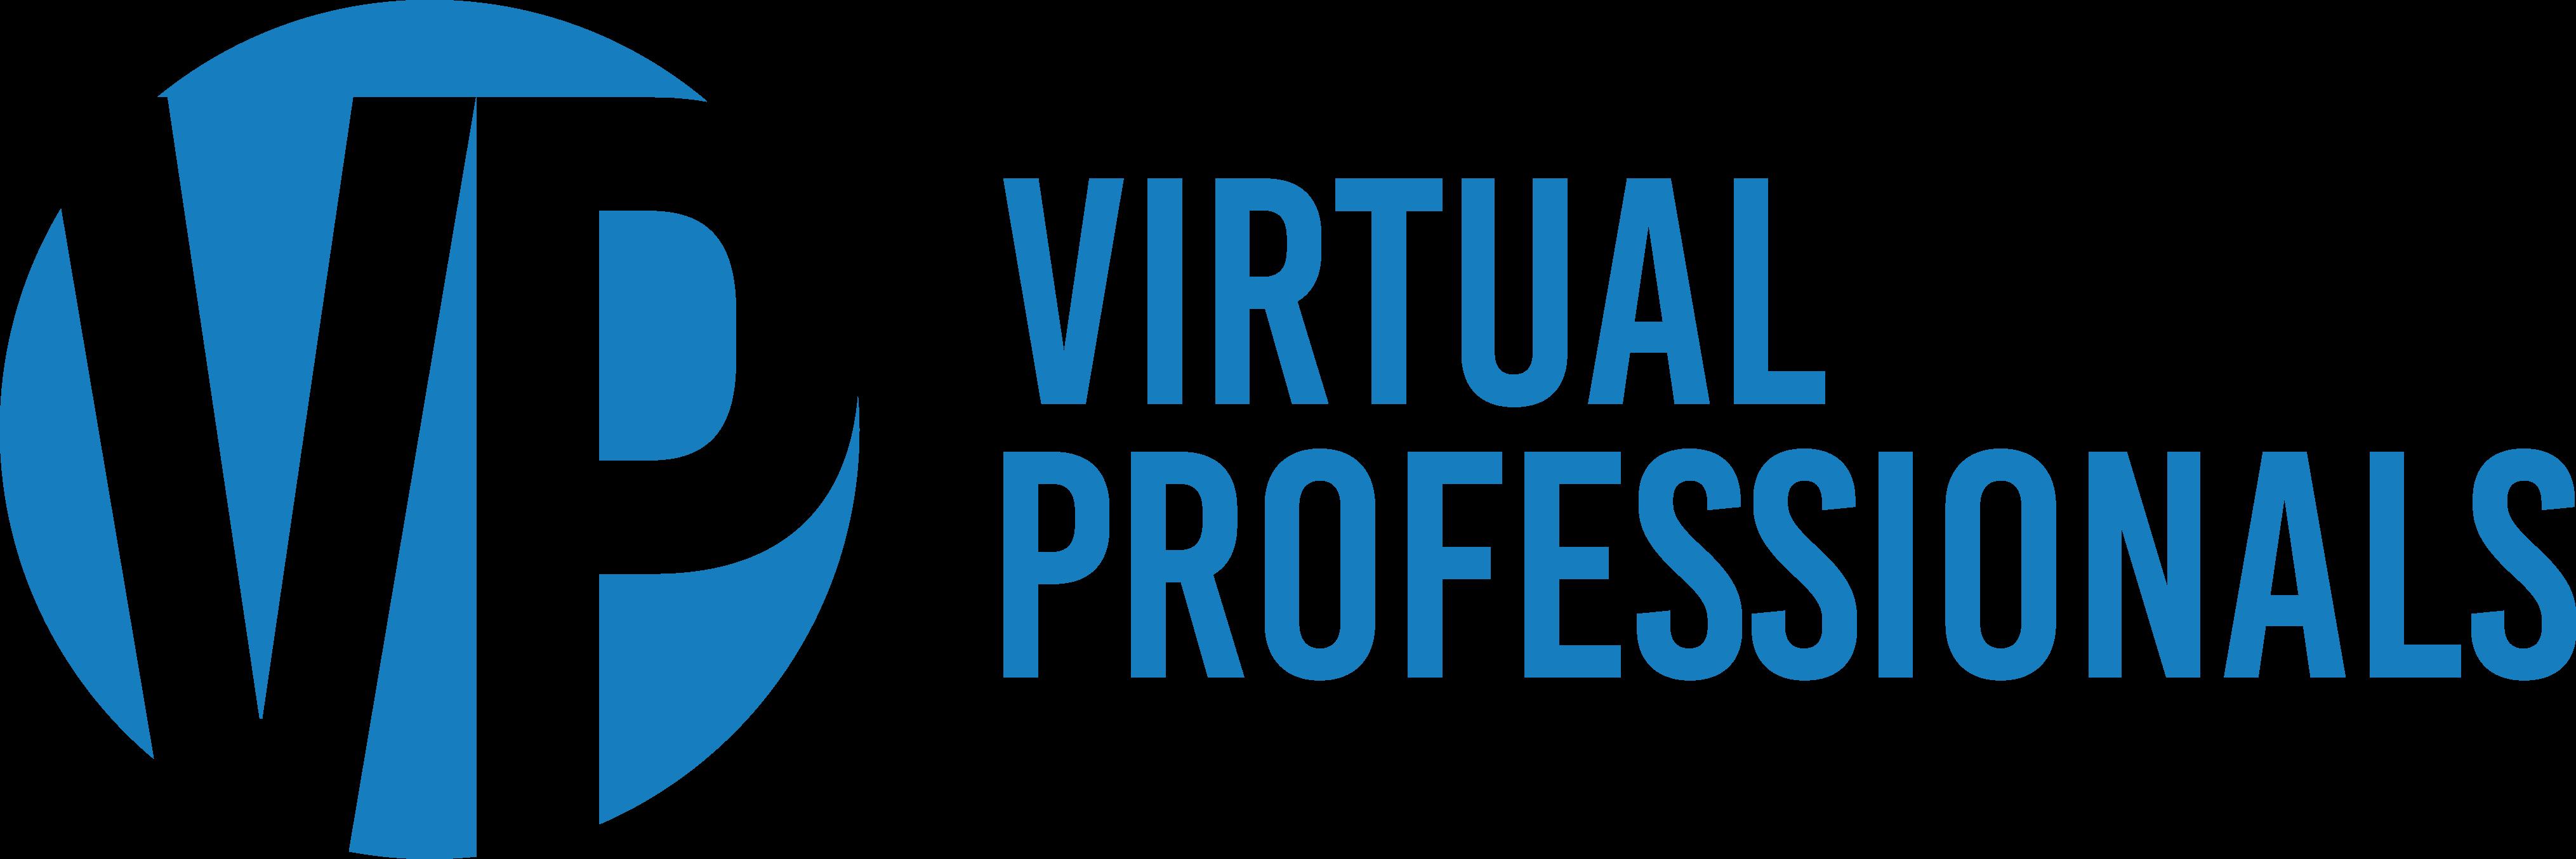 Virtual Professionals